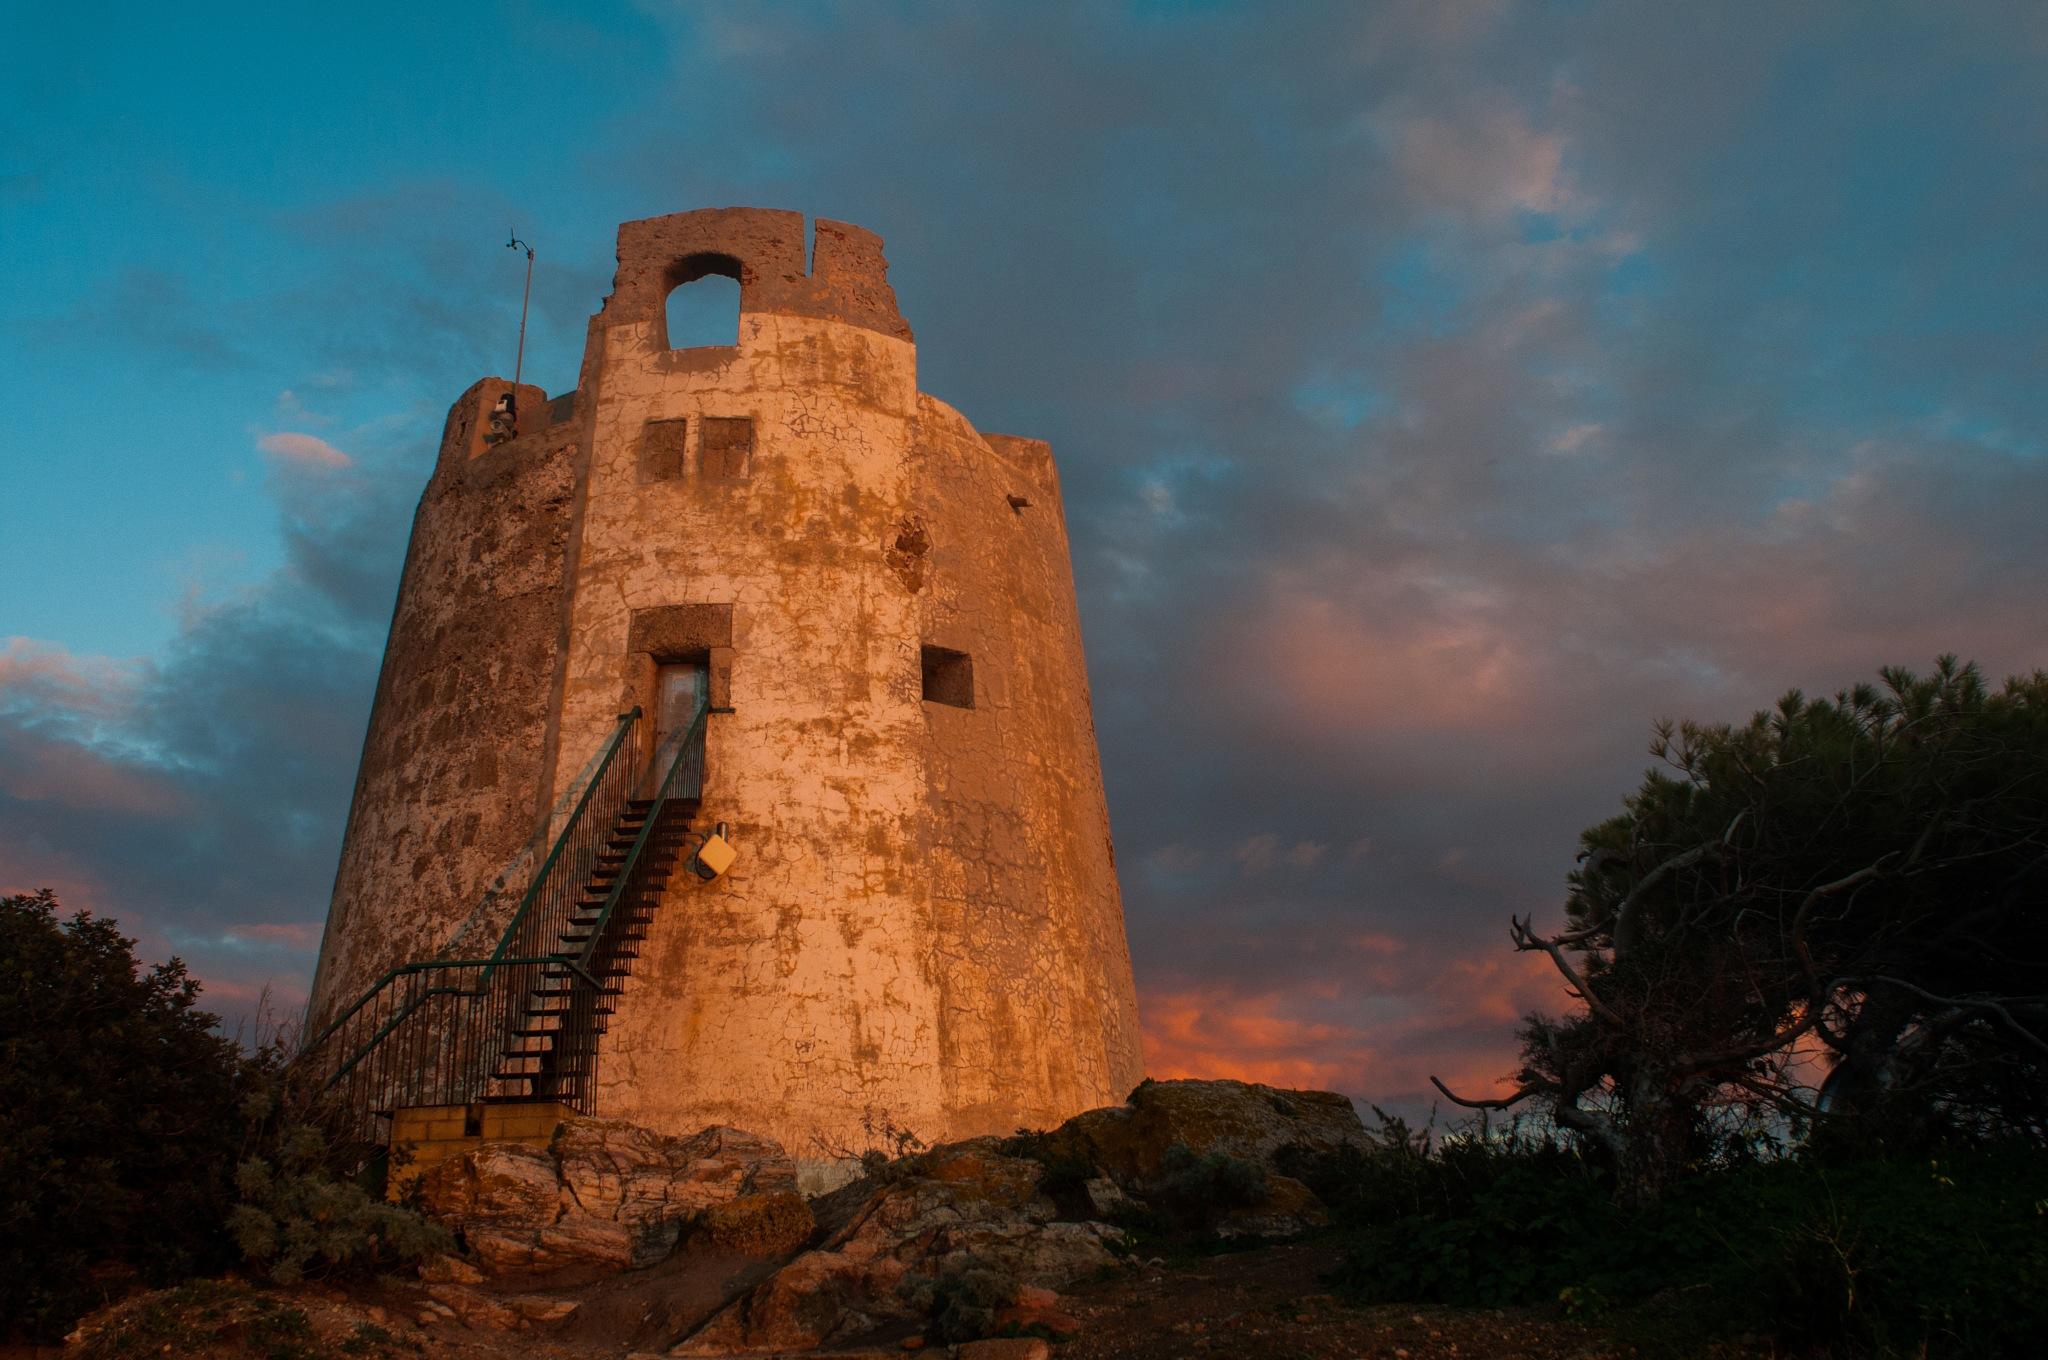 Torre di Chia (Domus De Maria/Sardegna) by corvonero